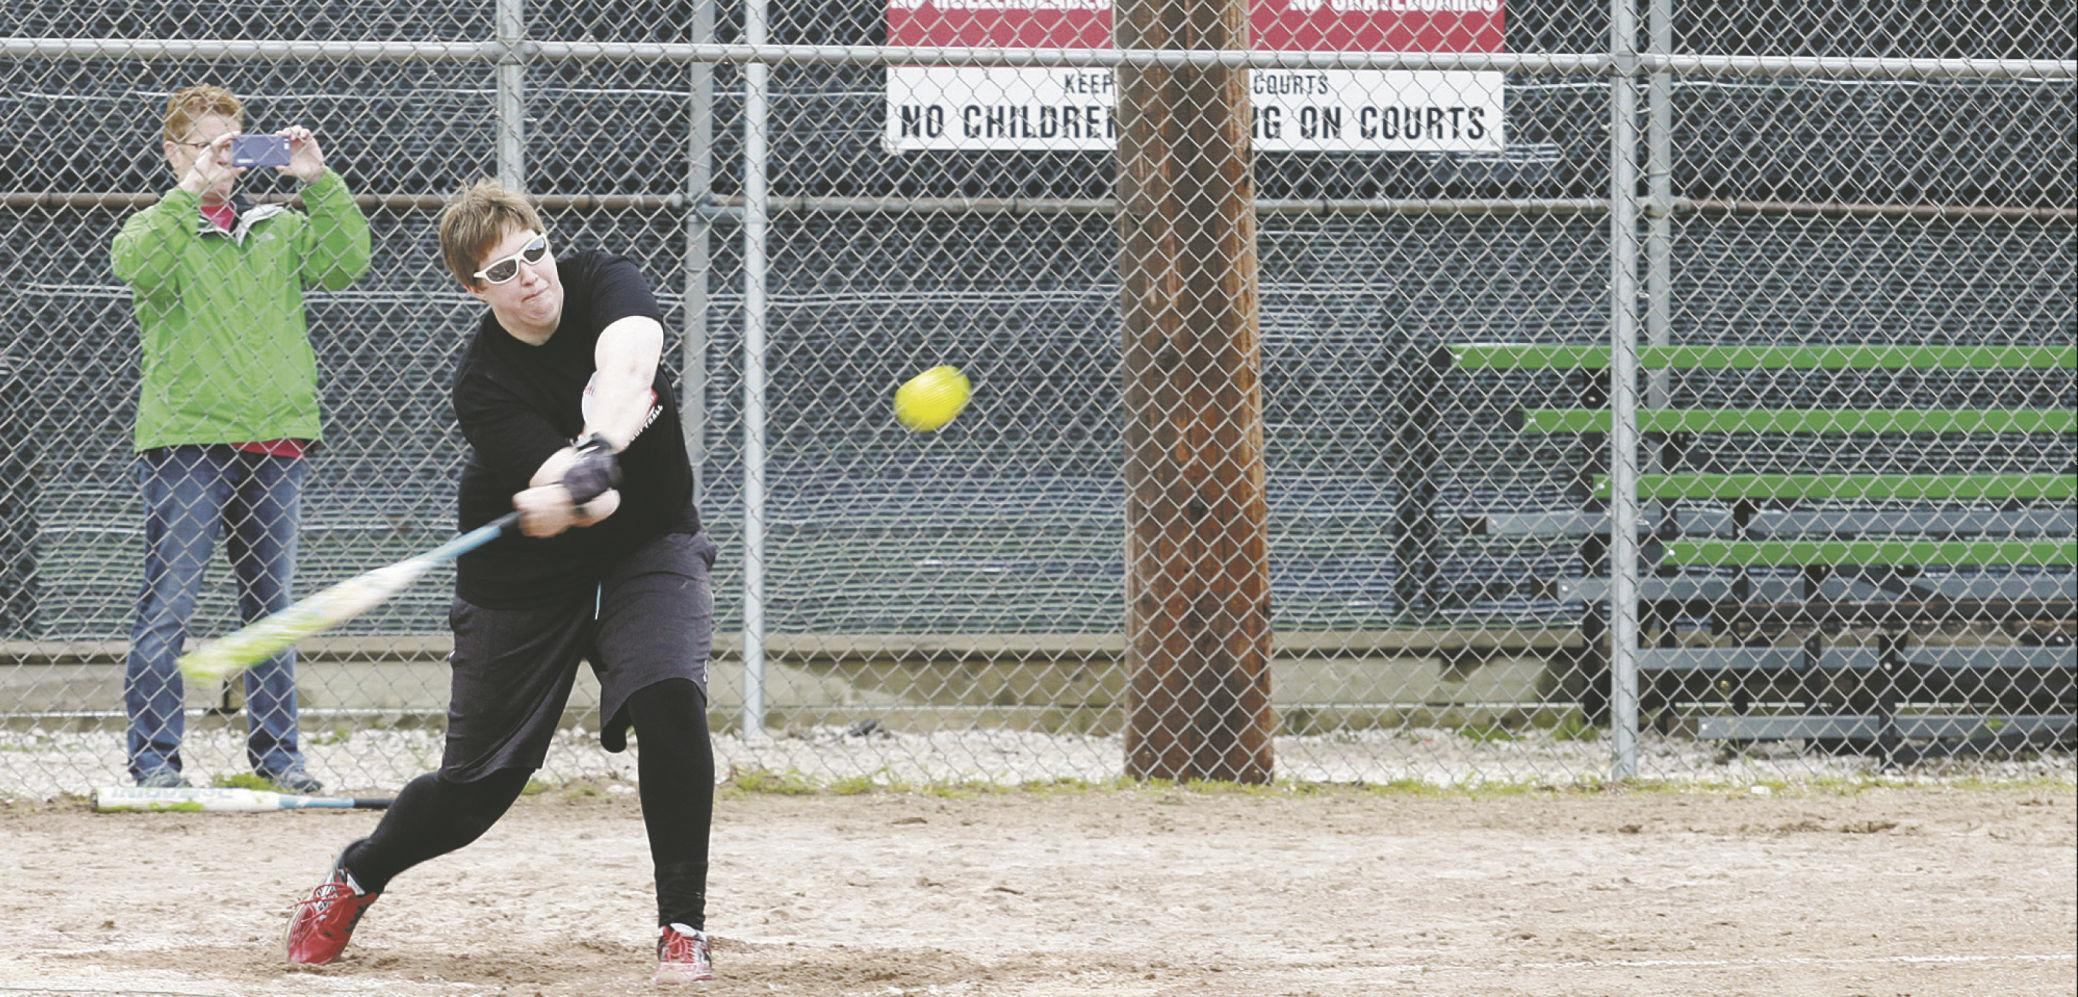 Charity softball 3